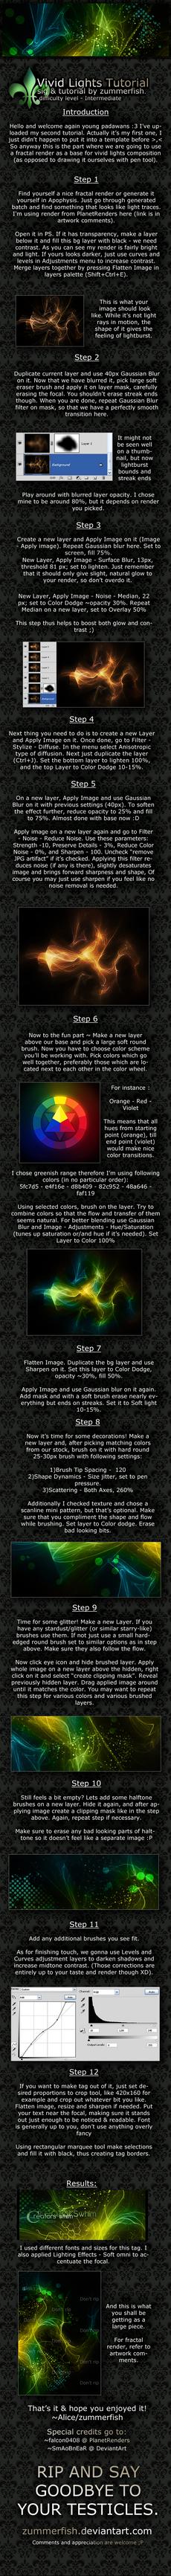 vivid lights_abstract tut by zummerfish